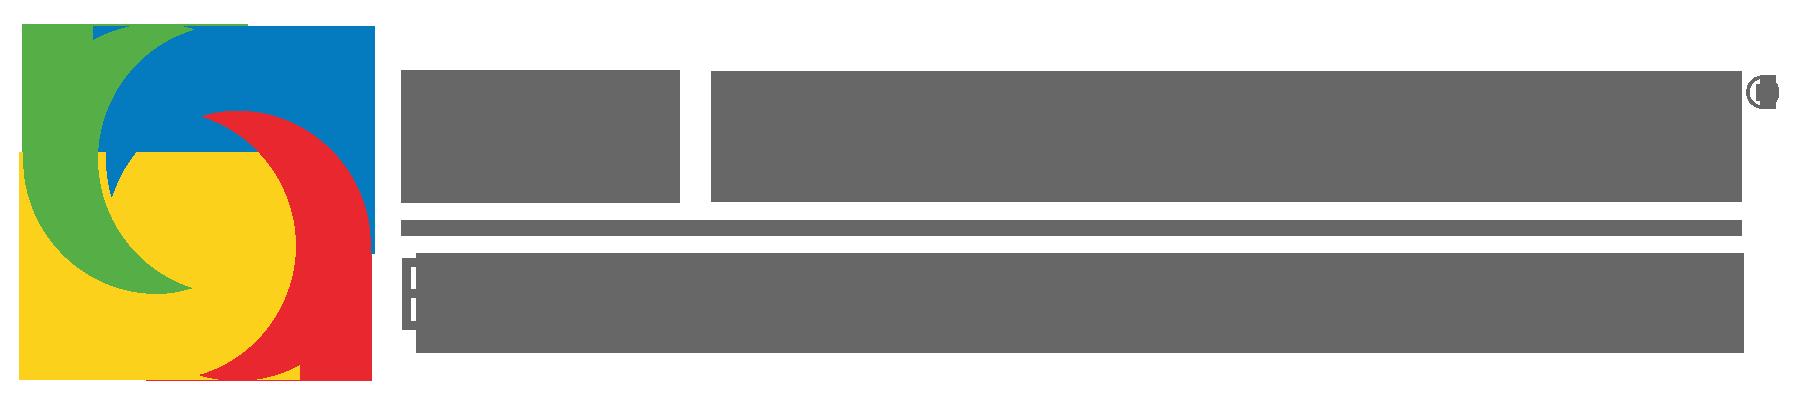 ROI Revolution Ecommerce Specialists e-commerce